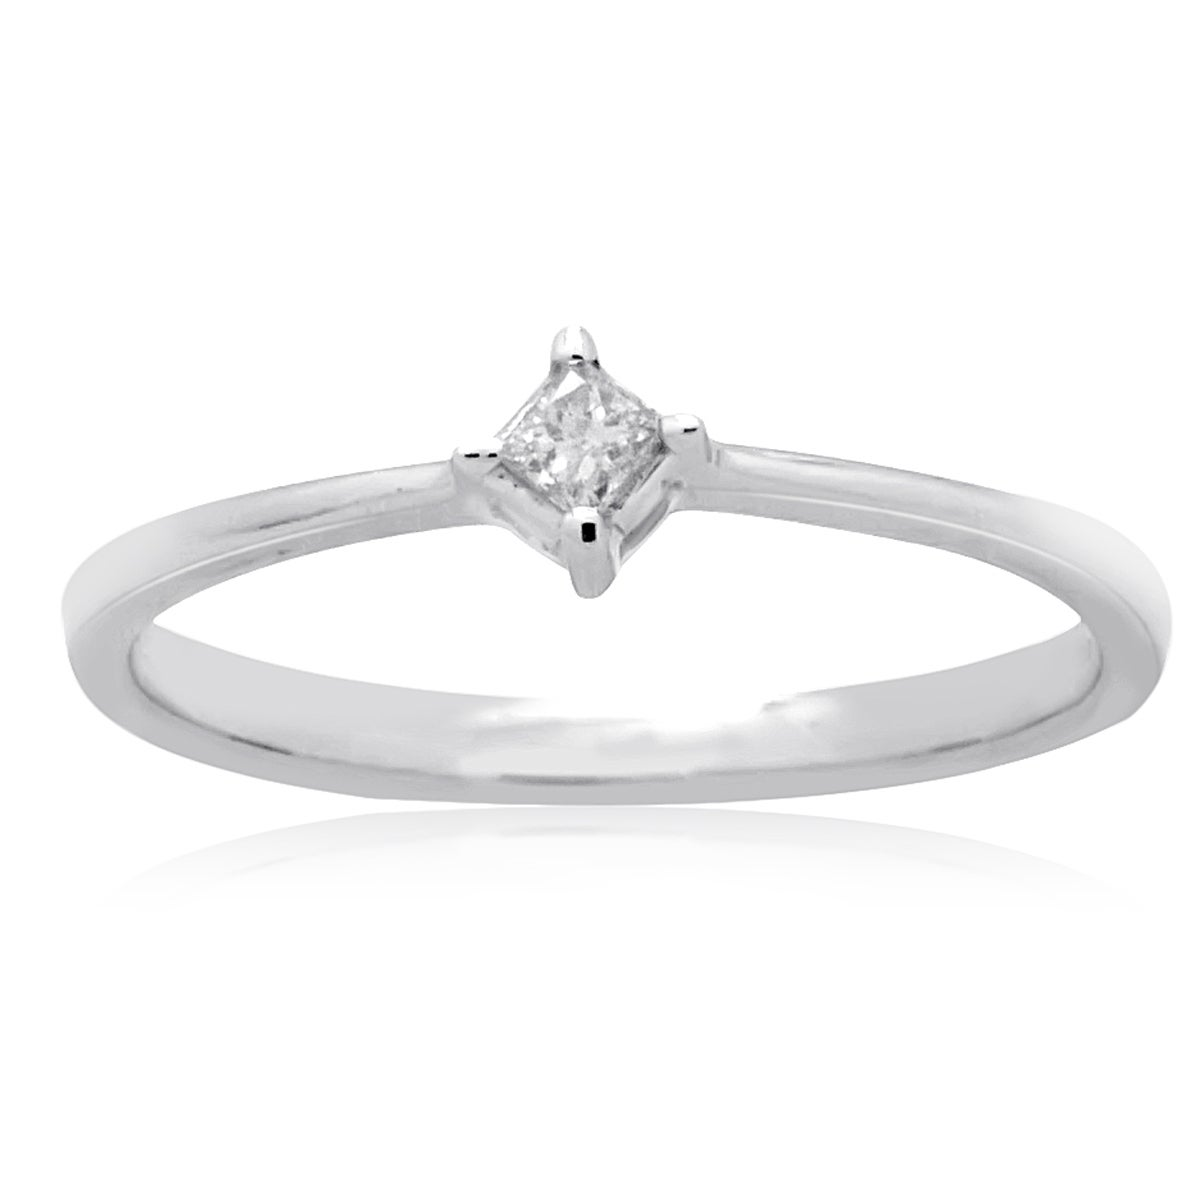 14k White Gold Princess-cut Diamond Accent Promise Solita...